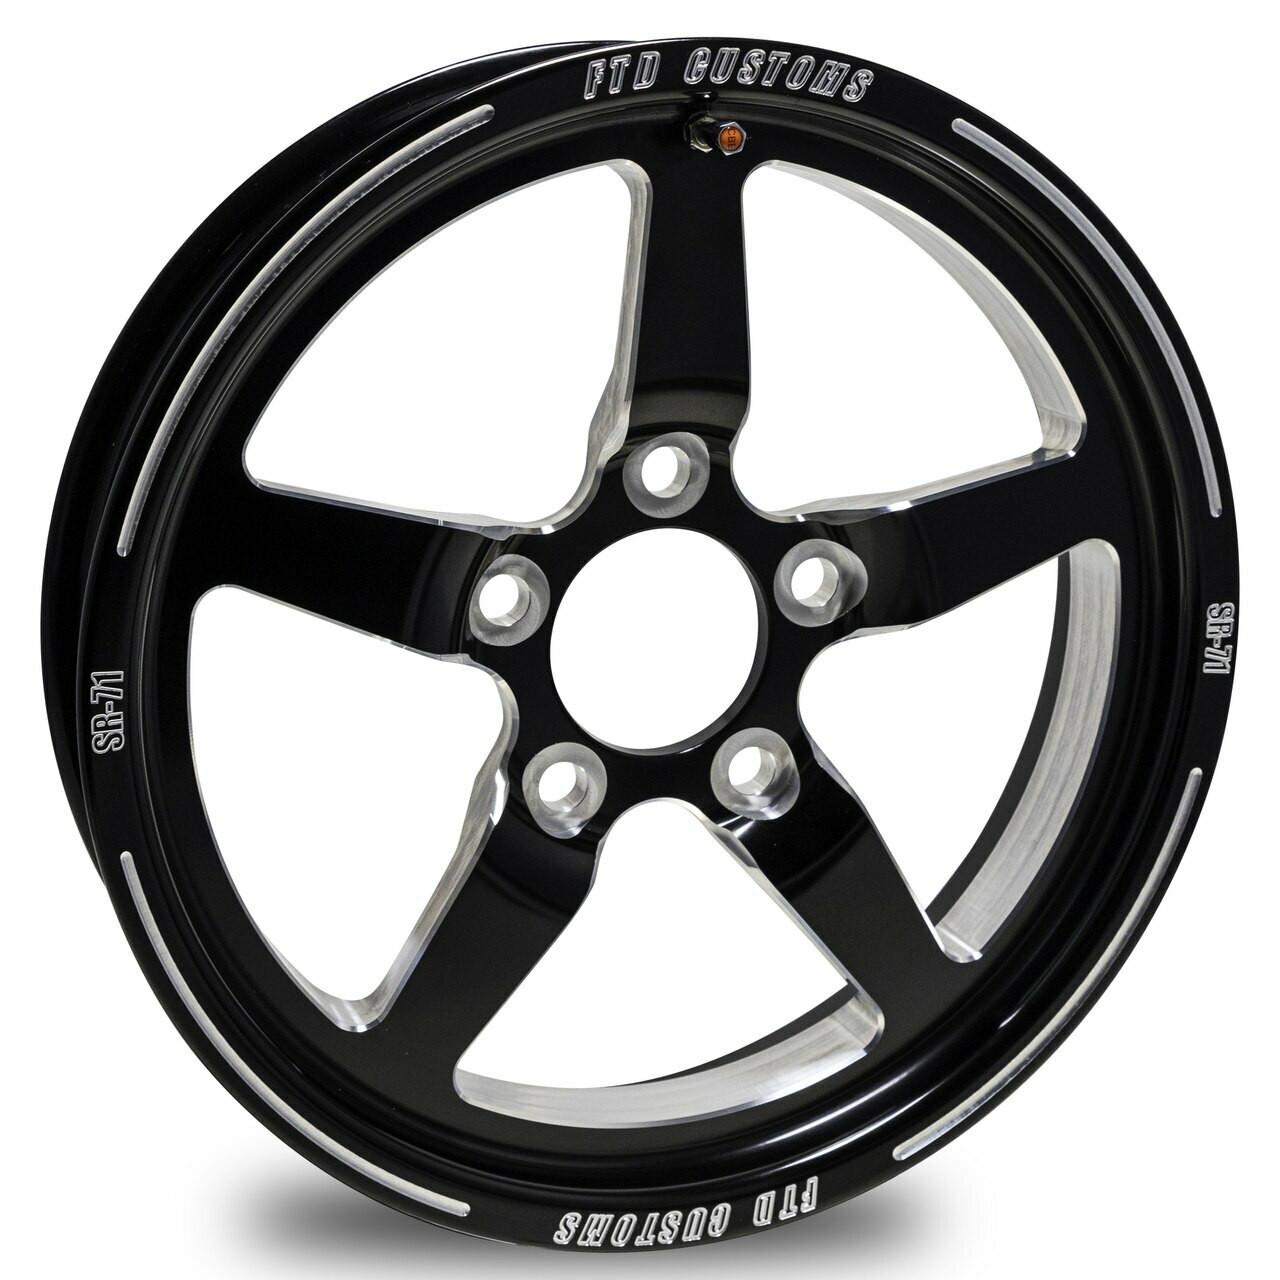 SR-71 Drag Racing Wheel - FTD Customs Racing Whees